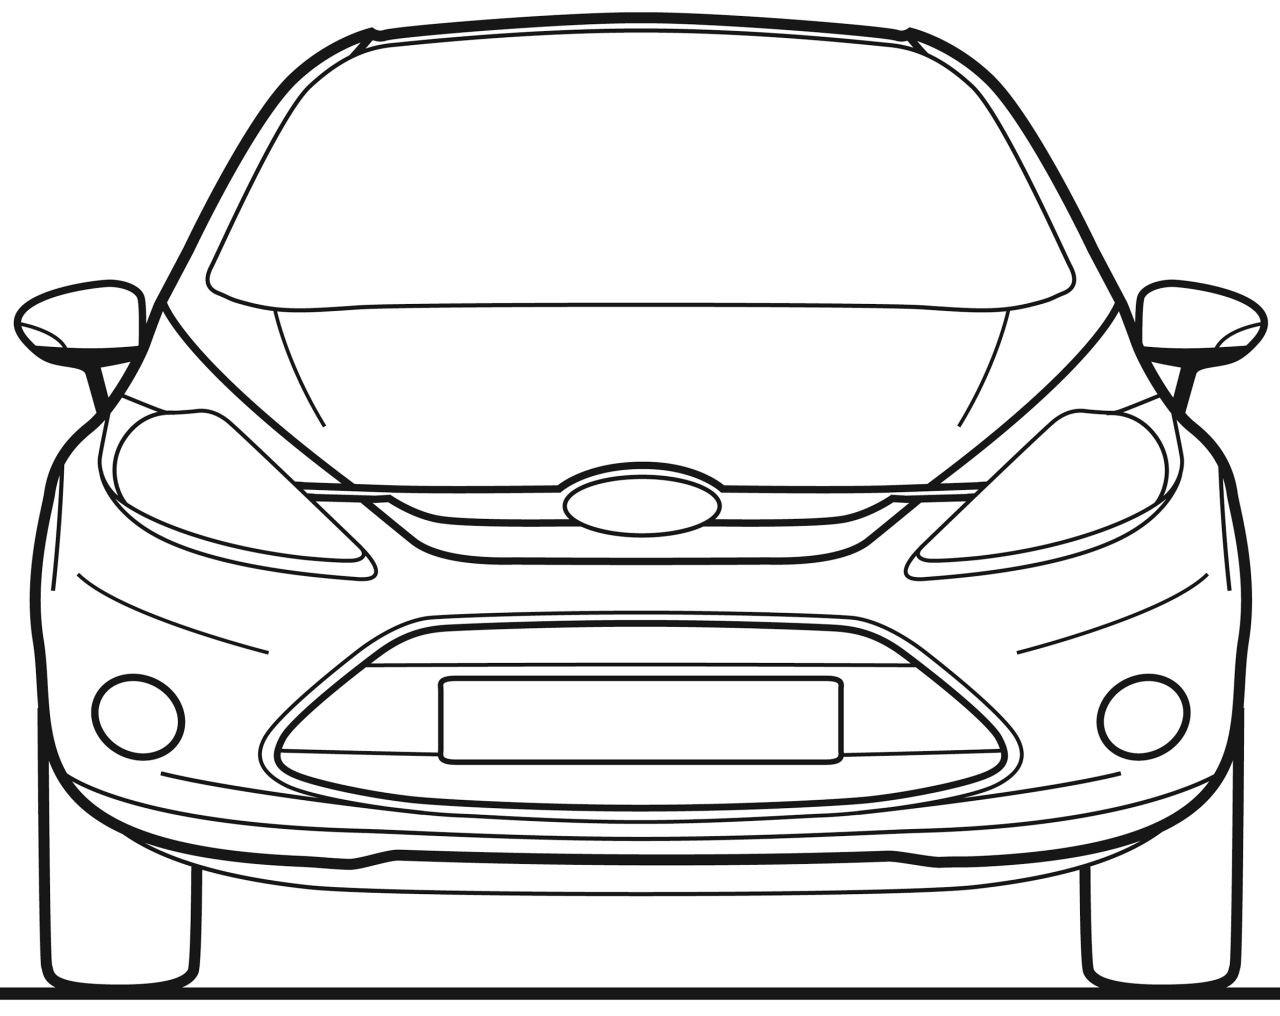 Masaüstü Illüstrasyon çizgi Sanat Ford 2012 Netcarshow Netcar